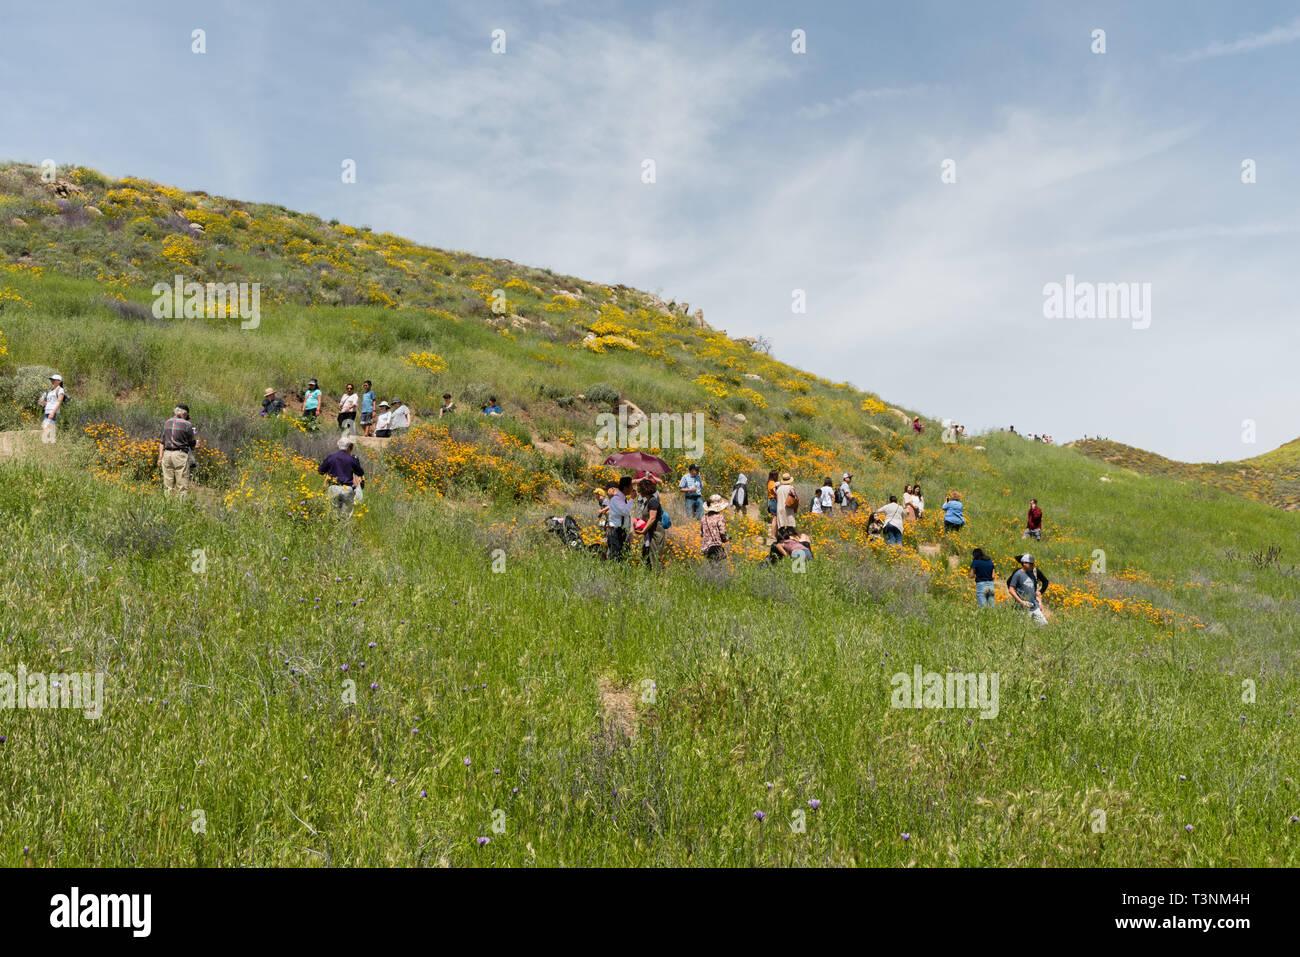 Residents of Southern California enjoying beautiful  superbloom vista in the Walker Canyon near Lake Elsinore Stock Photo